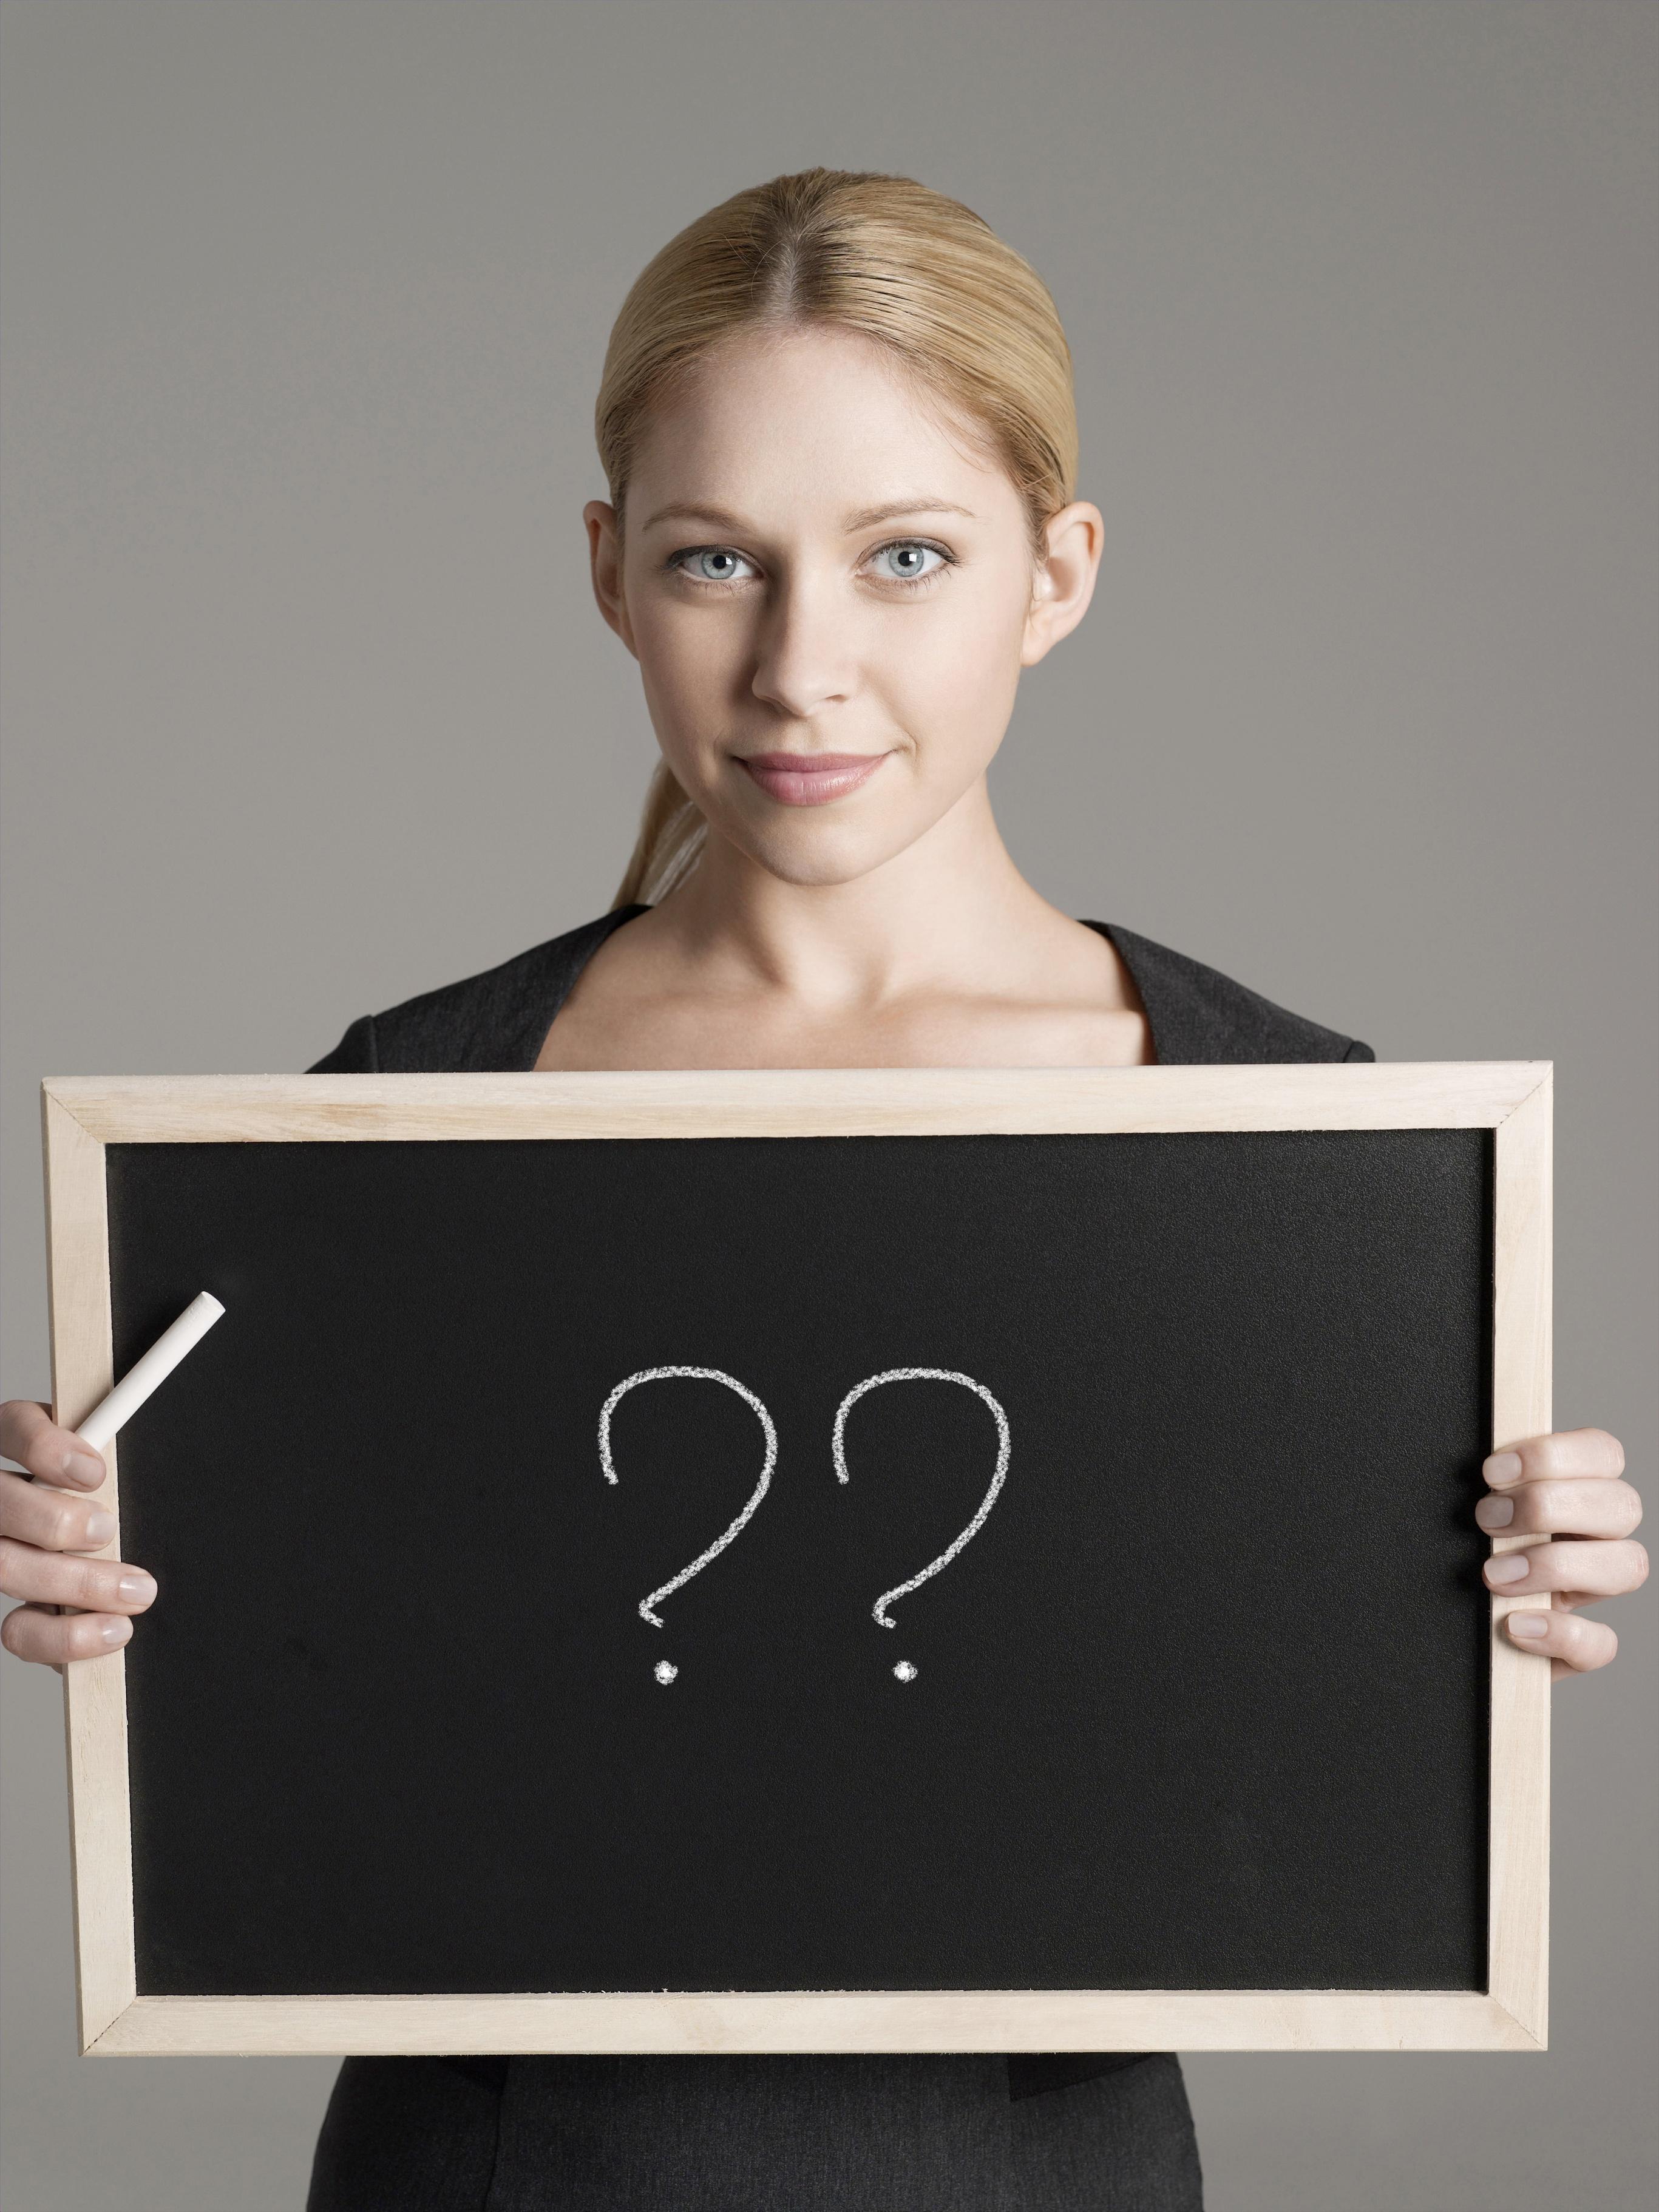 90 preguntas reveladoras que debes hacer para entender completamente a tu cliente